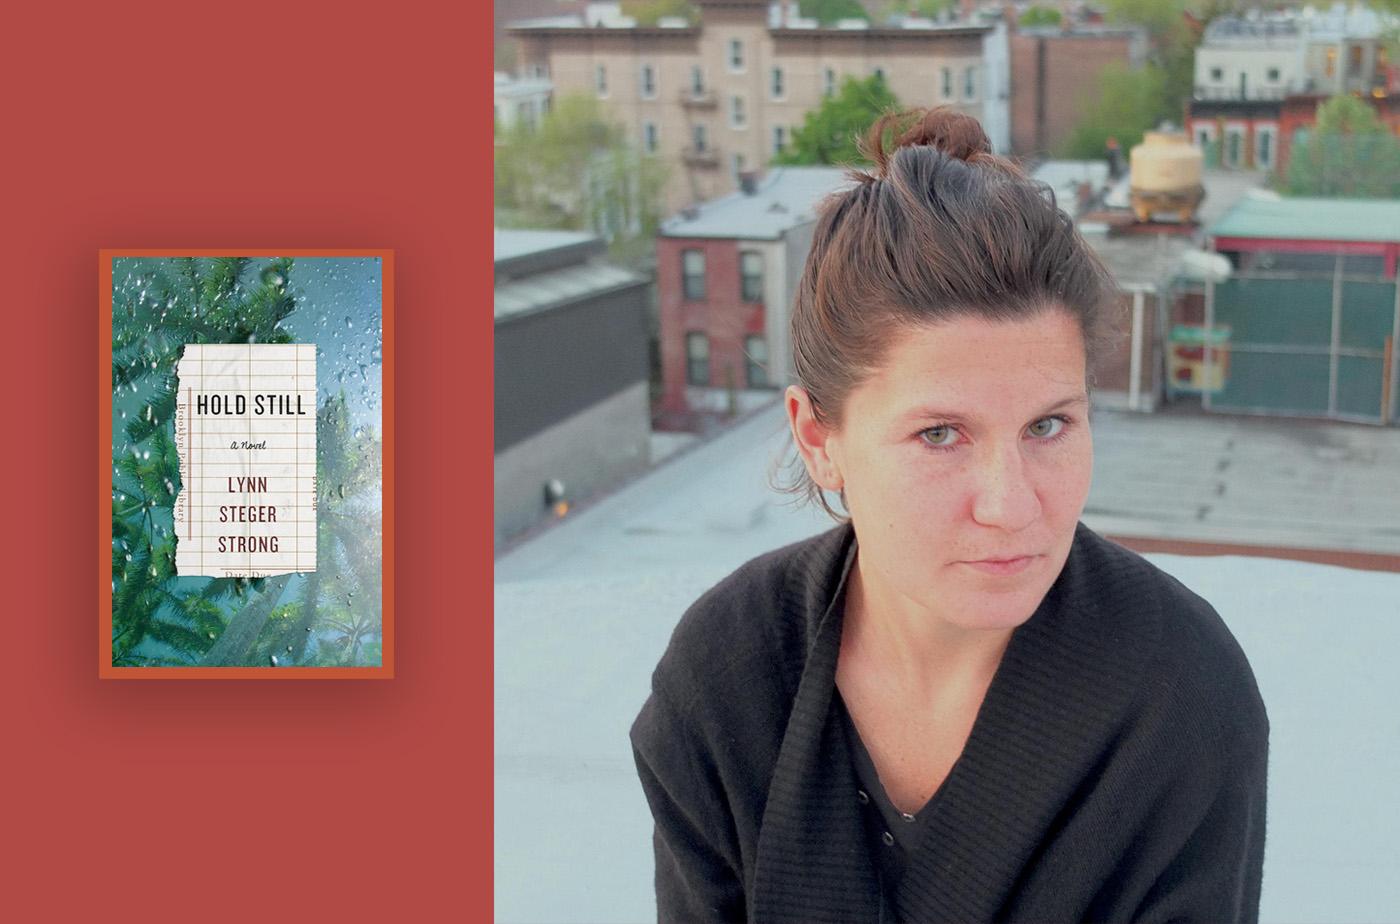 Catapult  classes: Lynn Steger Strong, 6-Week Generative Novel Workshop: Finding Your Container, Novel, Fiction, Workshop